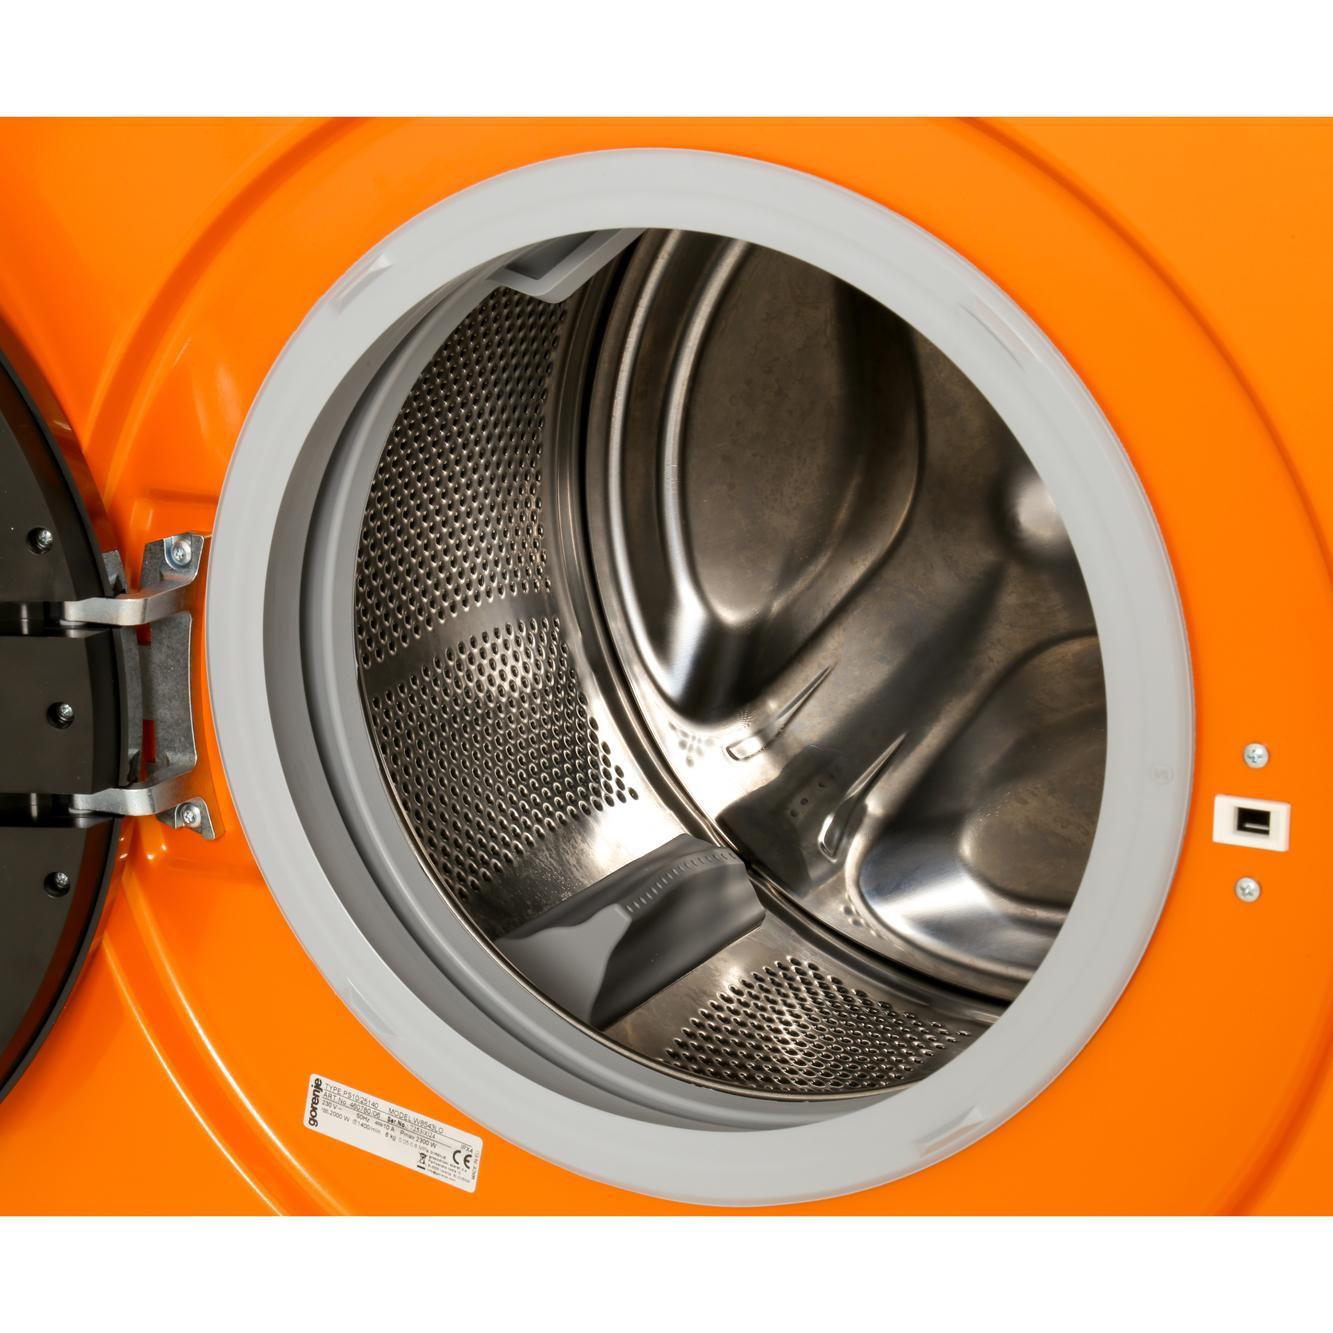 Buy Gorenje W8543lo Washing Machine Juicy Orange Marks